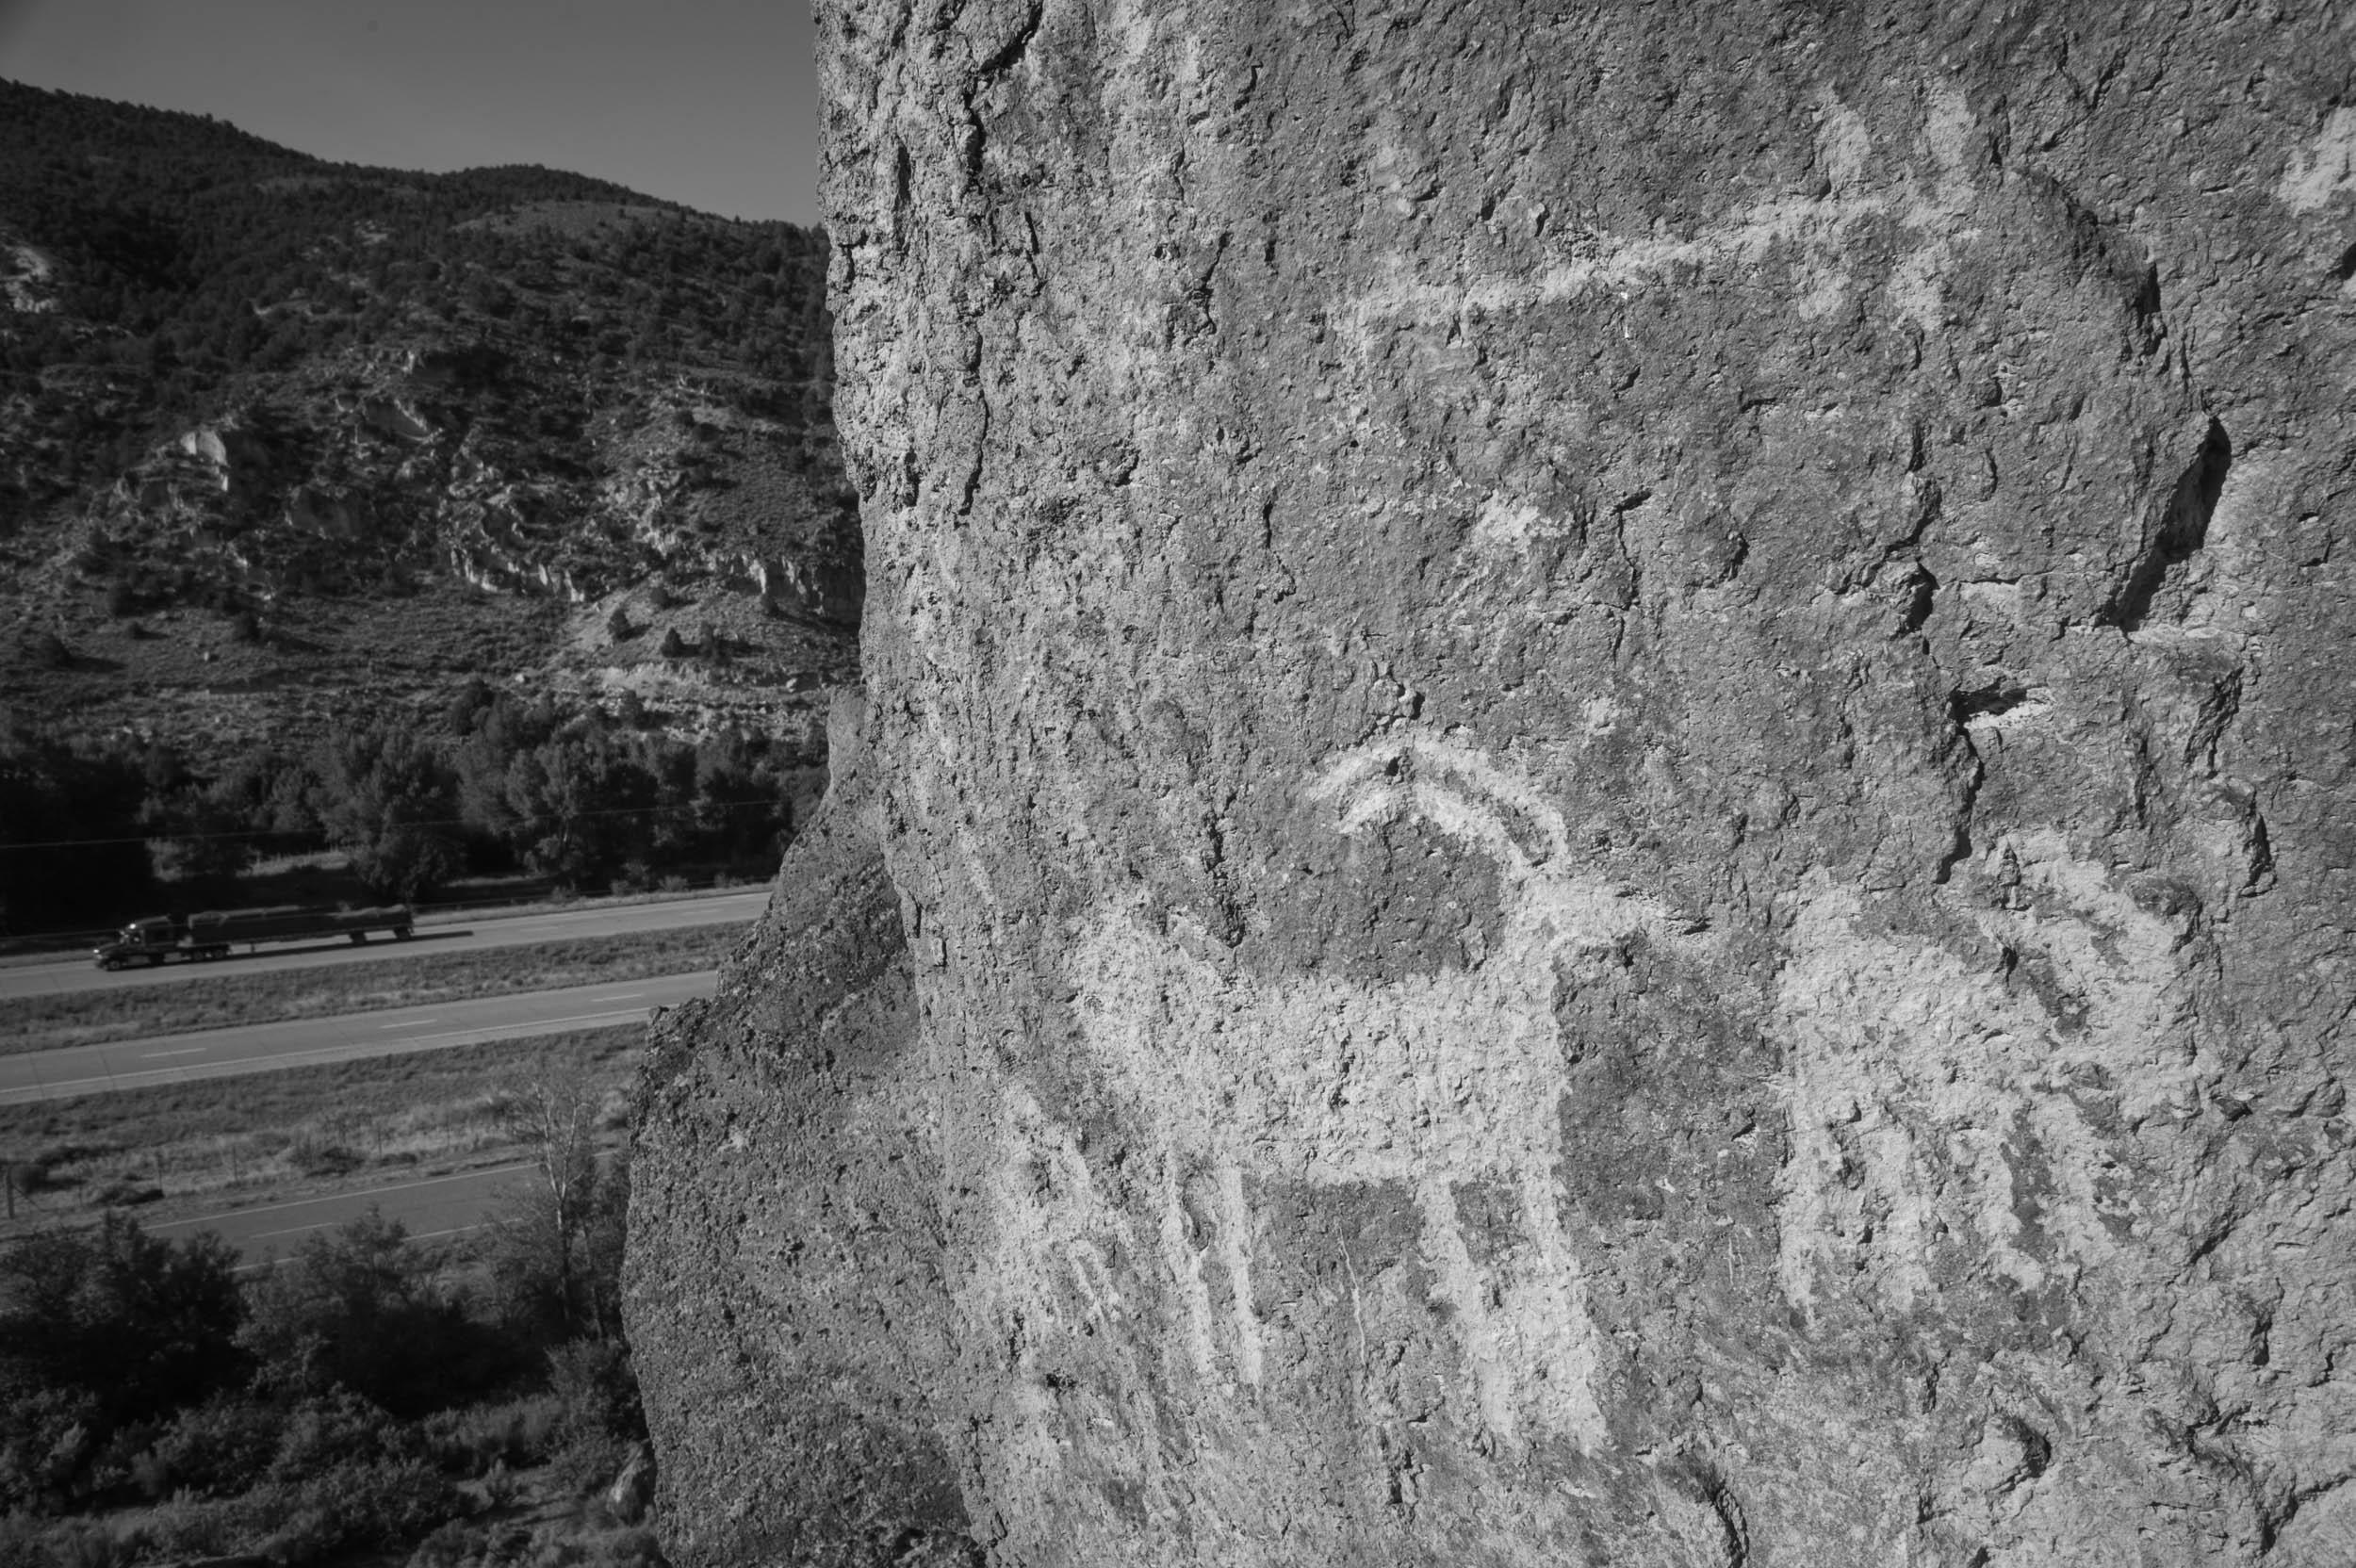 Petroglyphs along Interstate 70 in the Fremont Indian State Park, Utah.